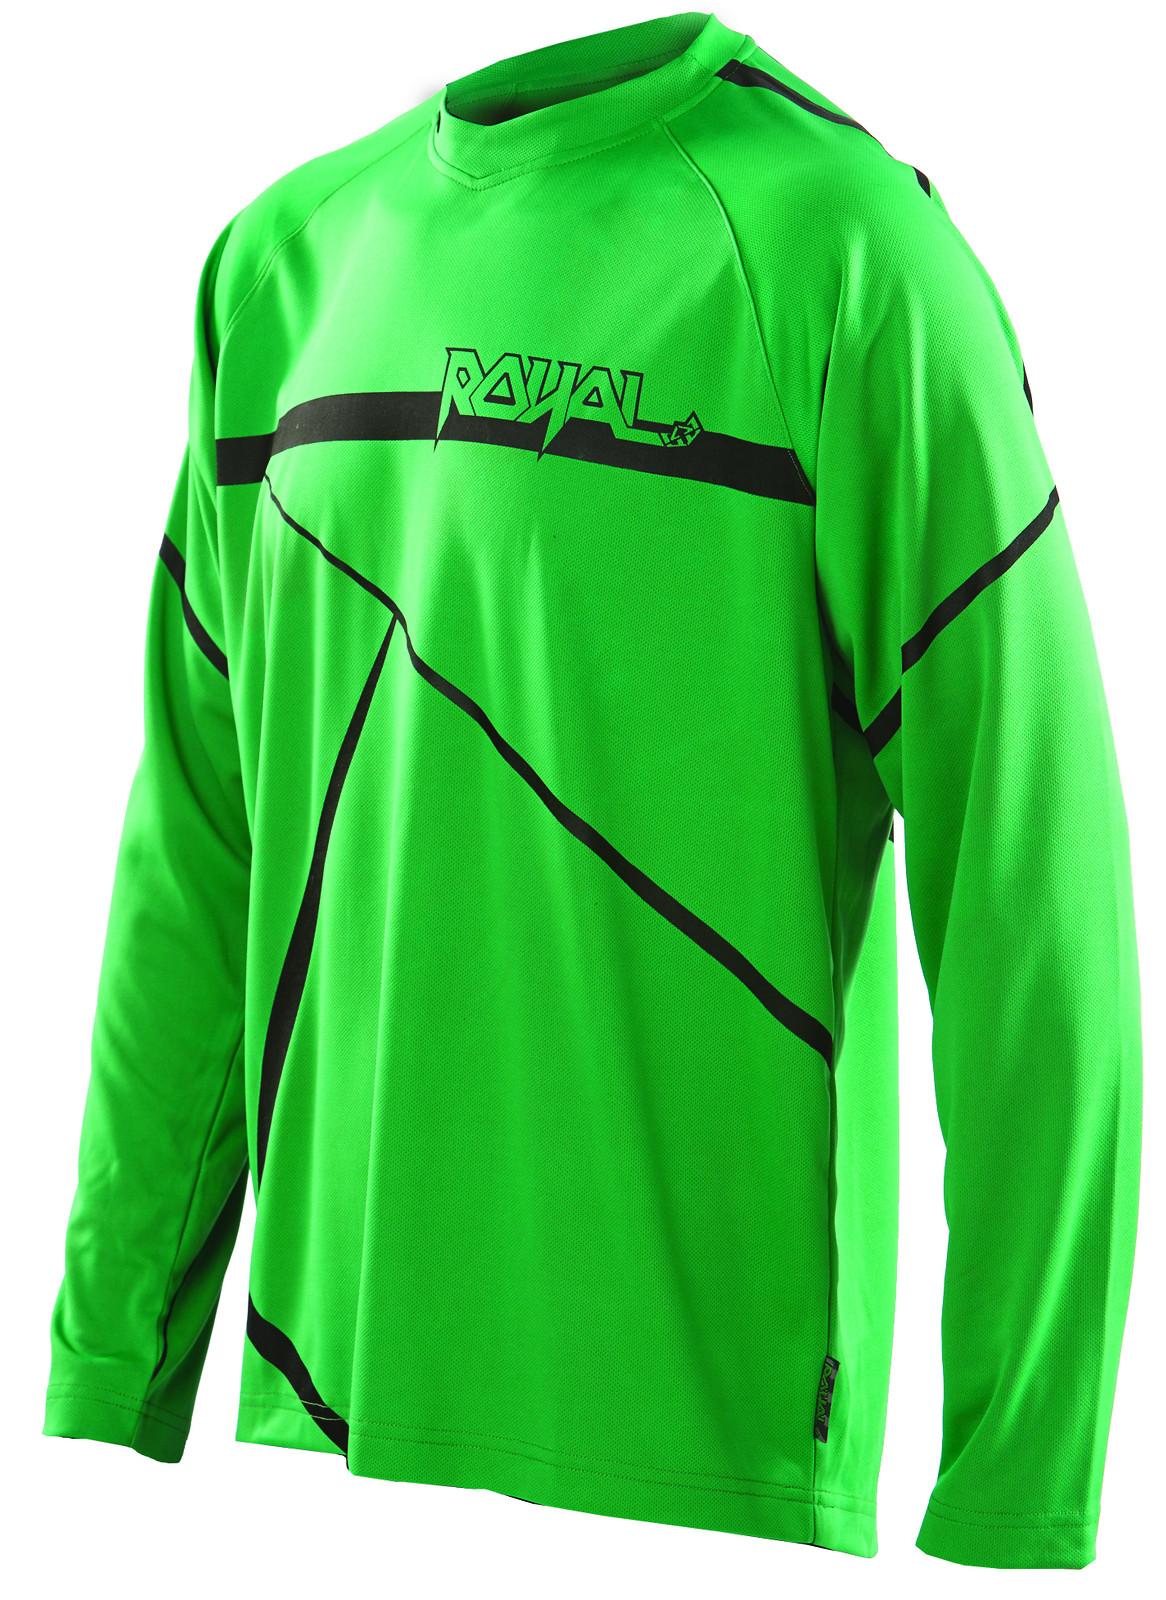 slice jersey green black f